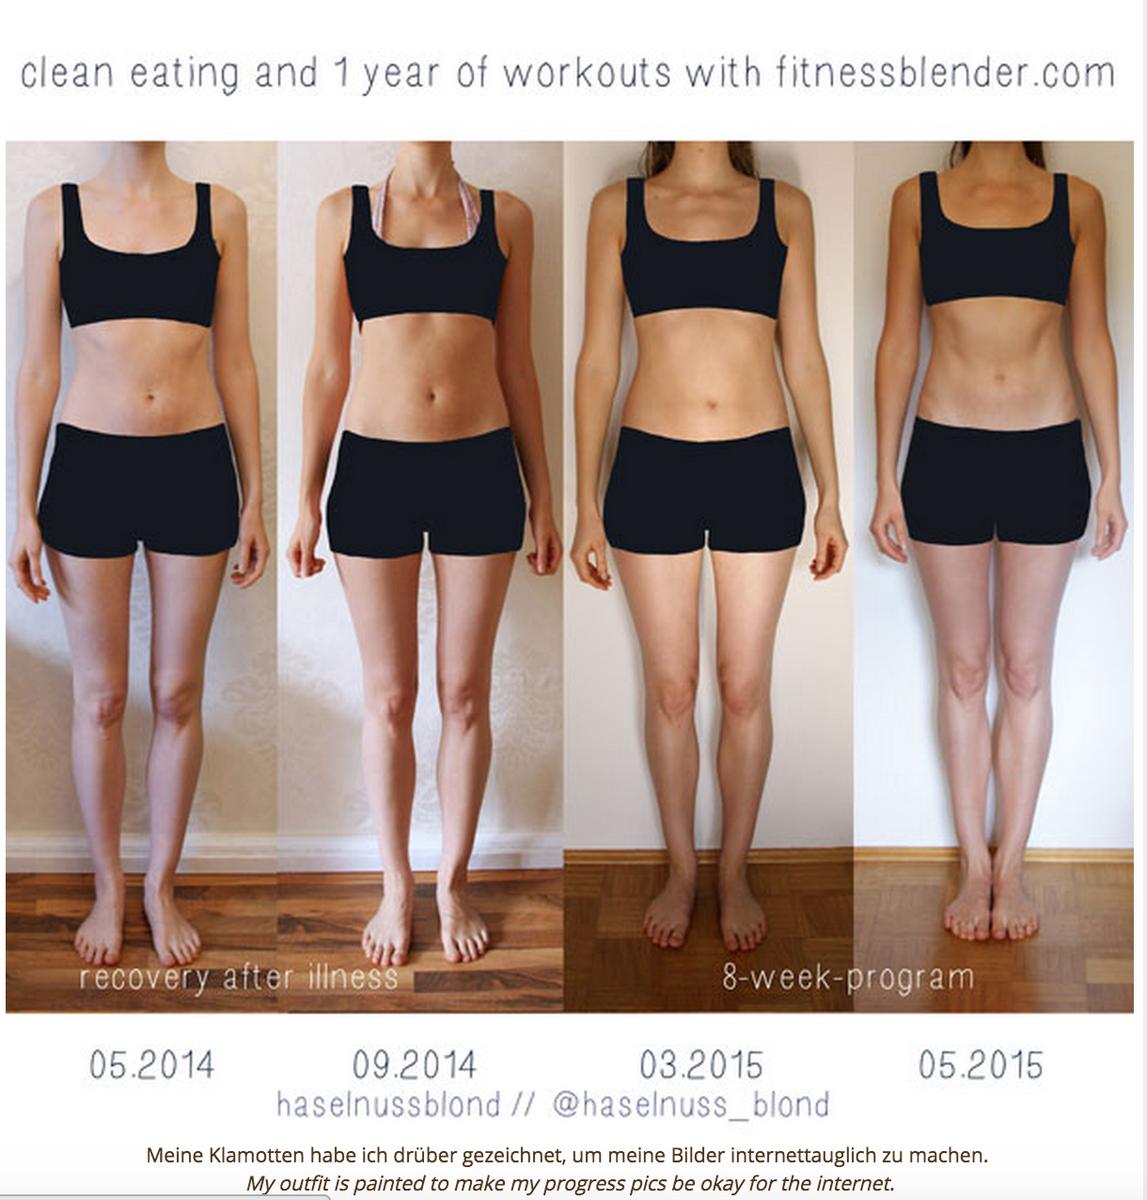 Atomidine weight loss